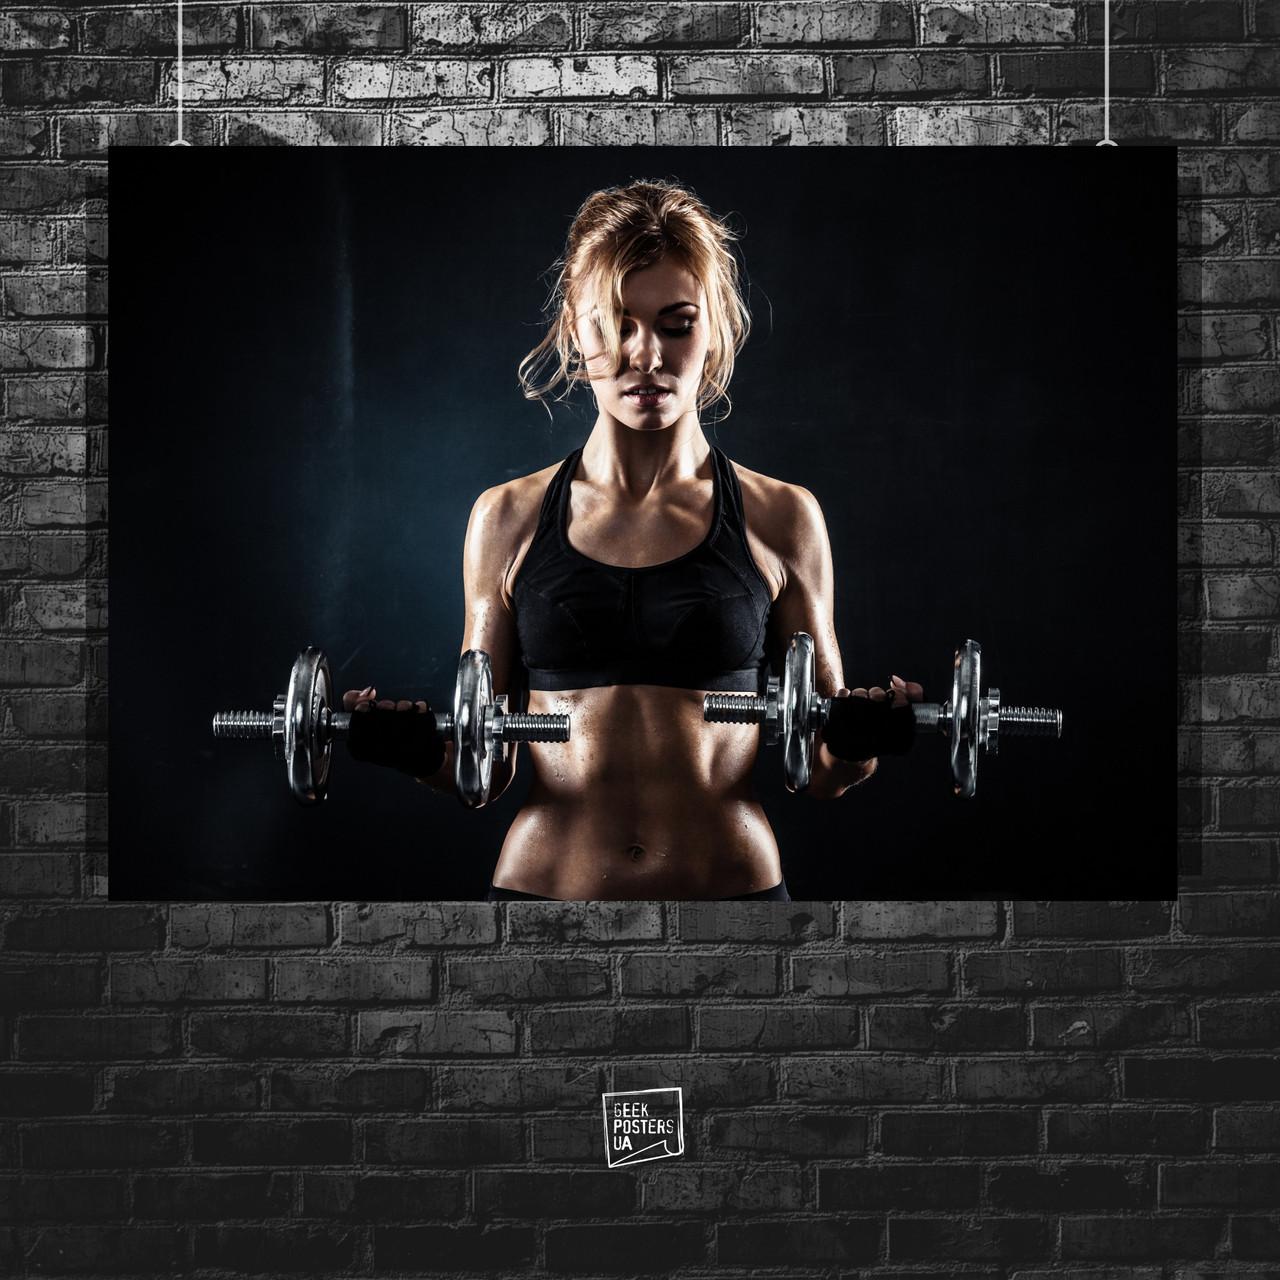 Постер Девушка, фитнес, шейпинг, плакат в спортзал. Размер 60x42см (A2). Глянцевая бумага